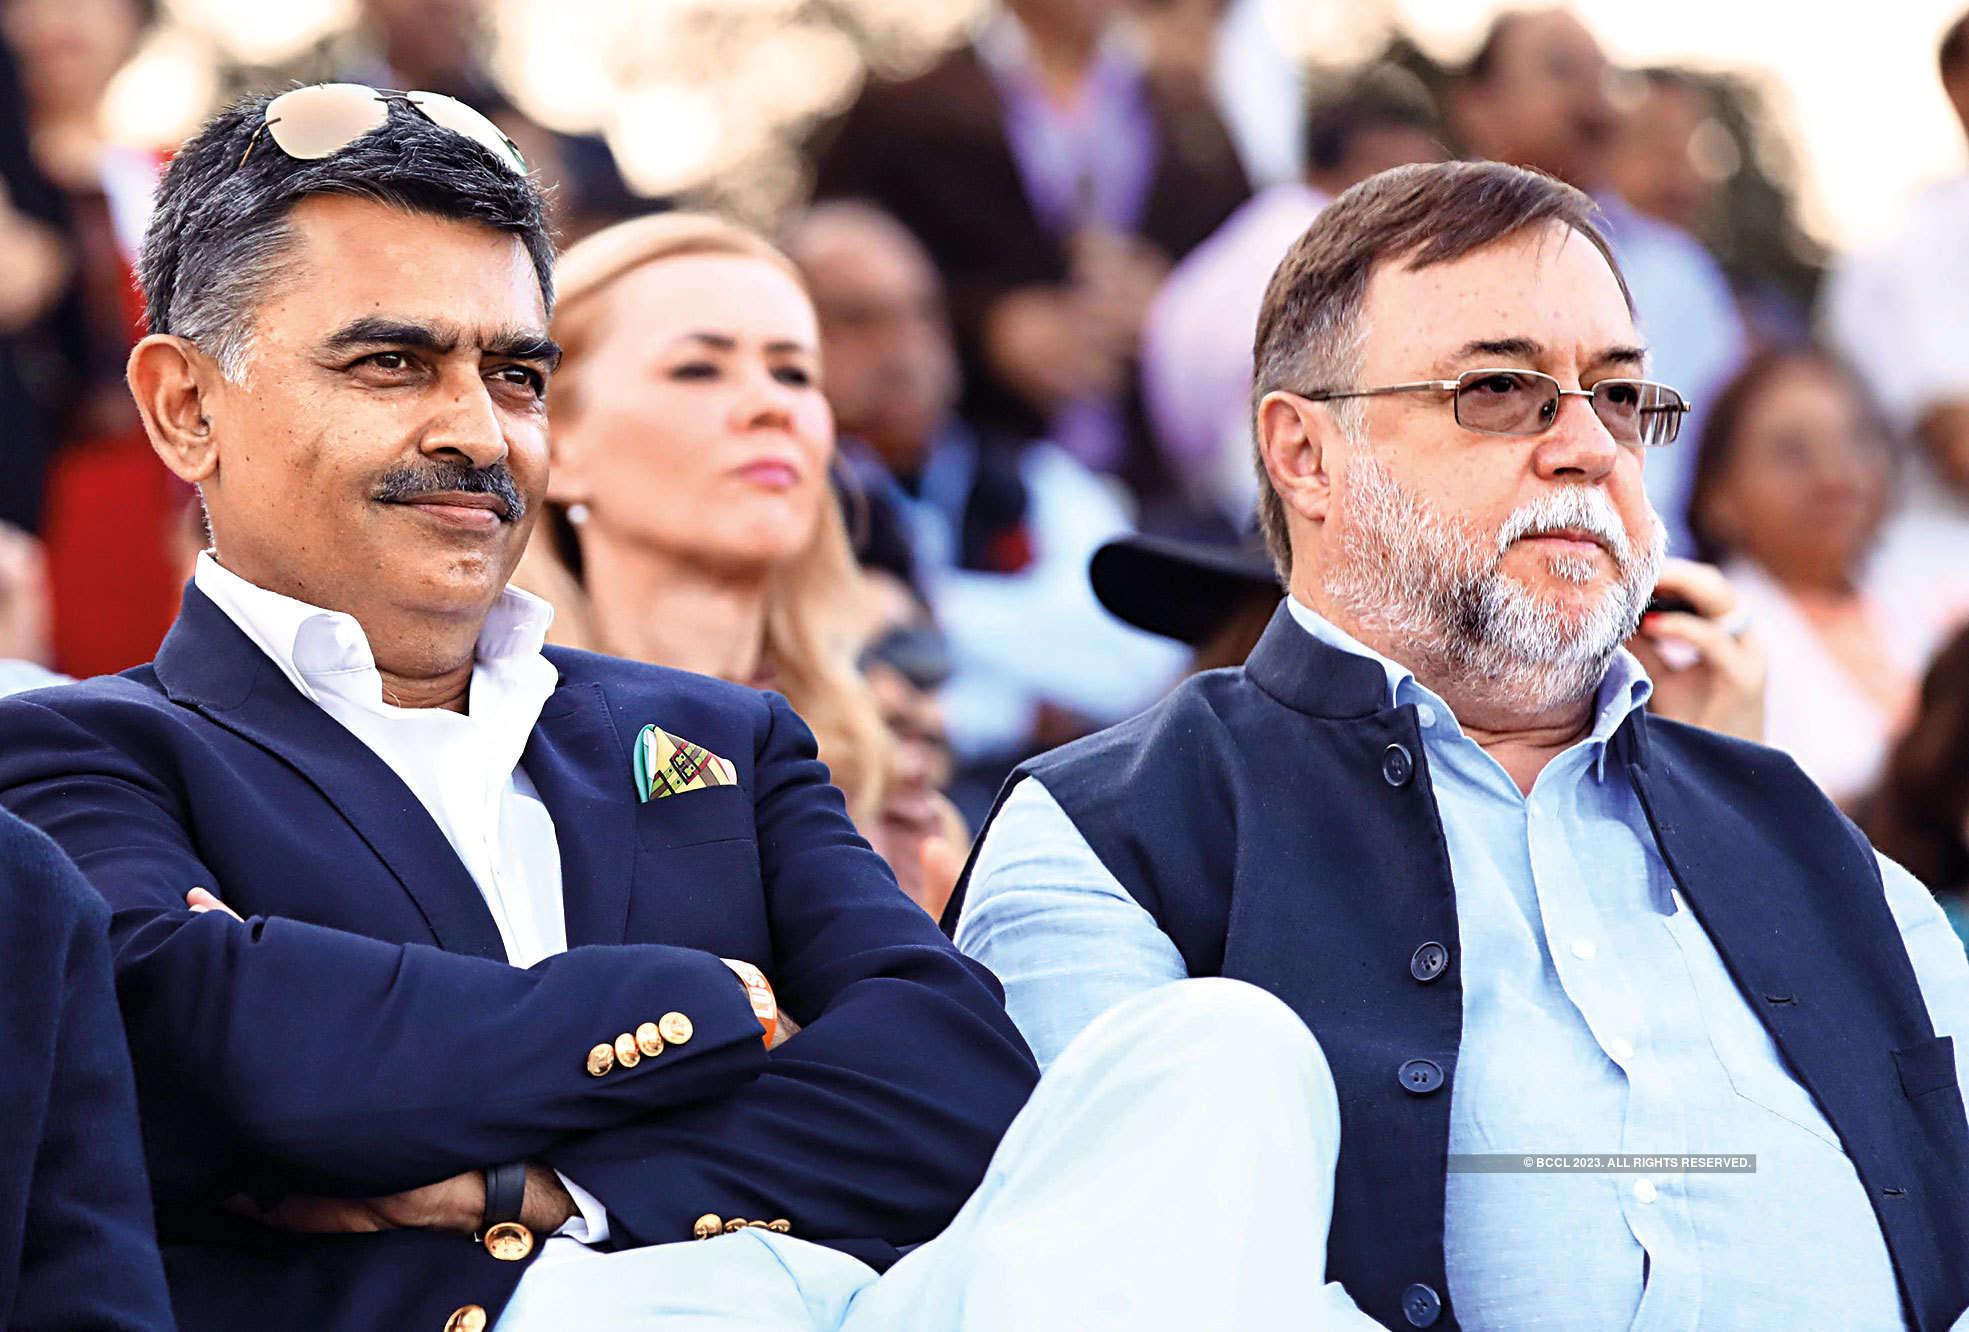 Adhiraj Singh and Daniel Chuburu,  Ambassador of Argentina